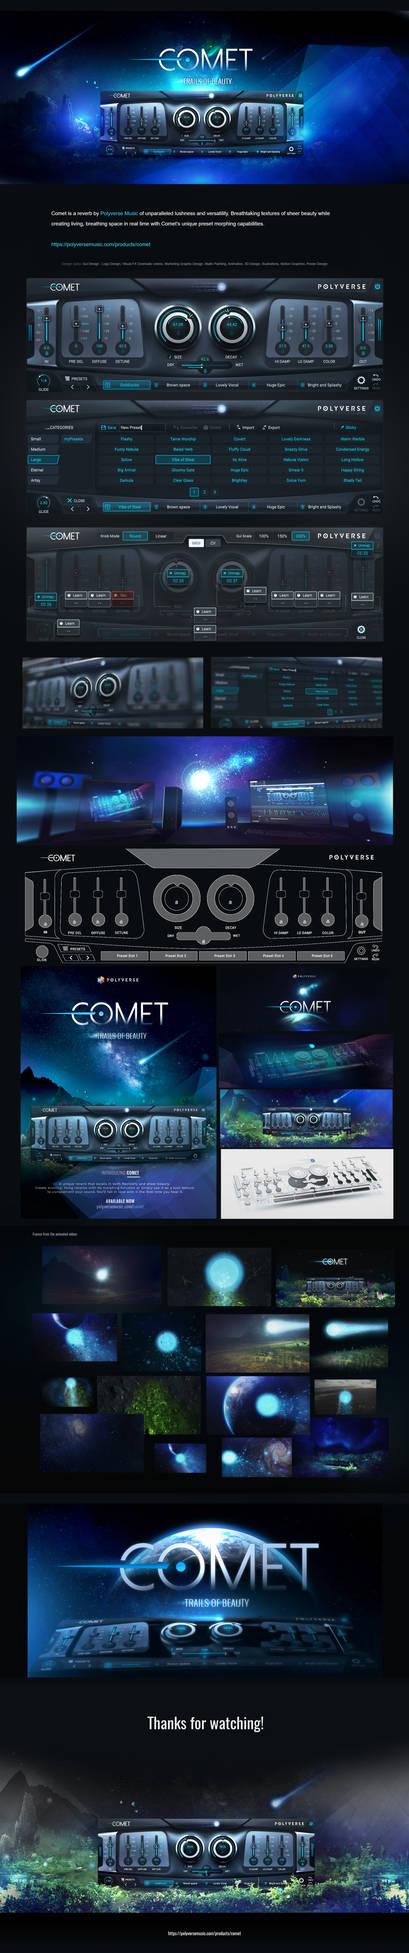 Scott Kane Professional Interface Designer Deviantart